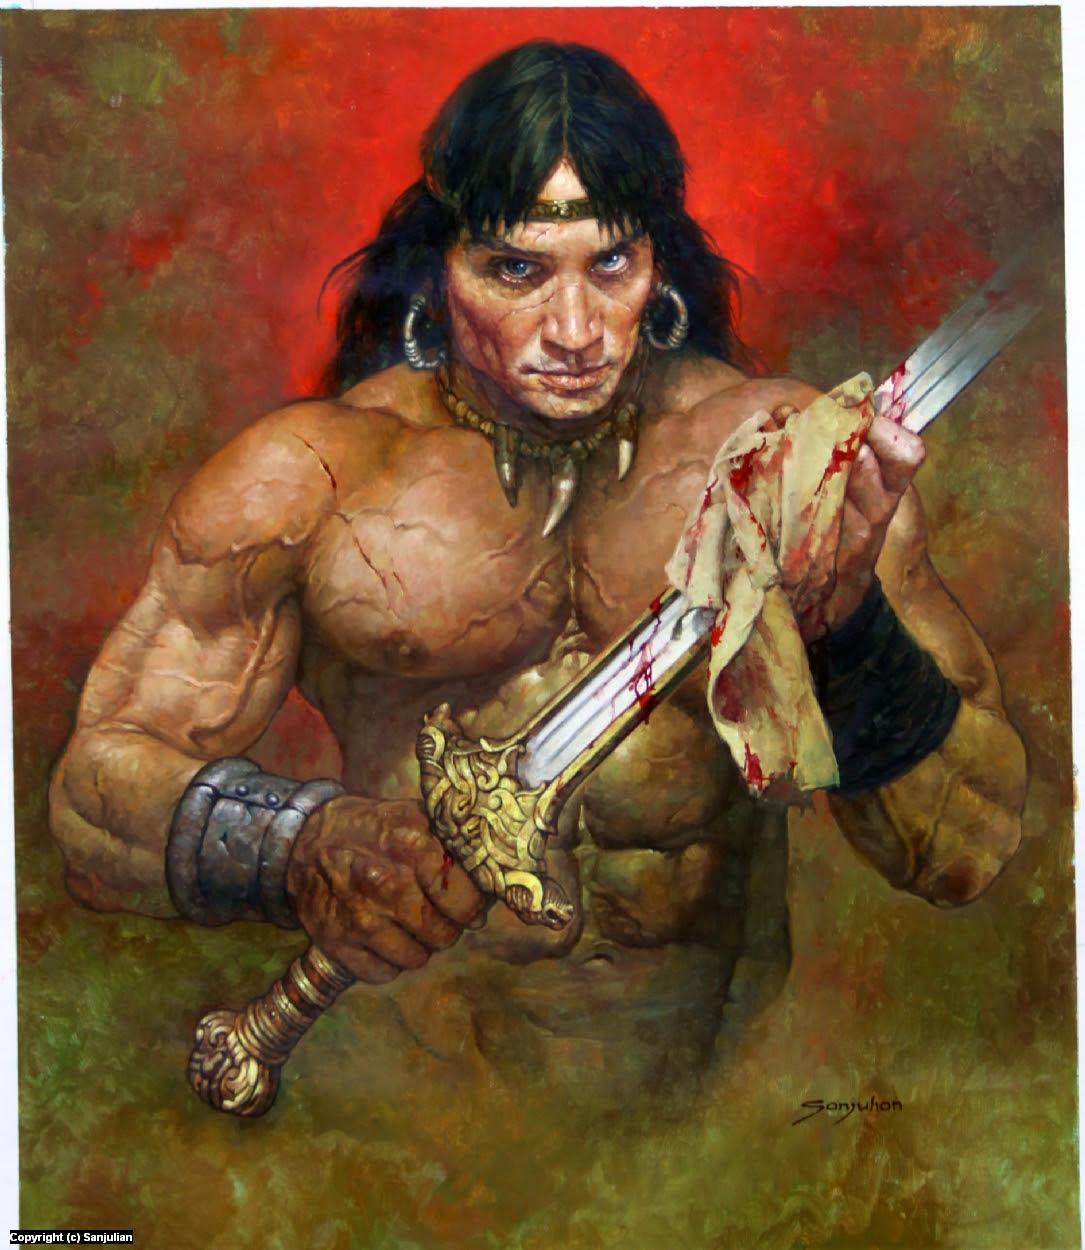 Conan Artwork by Manuel Sanjulian